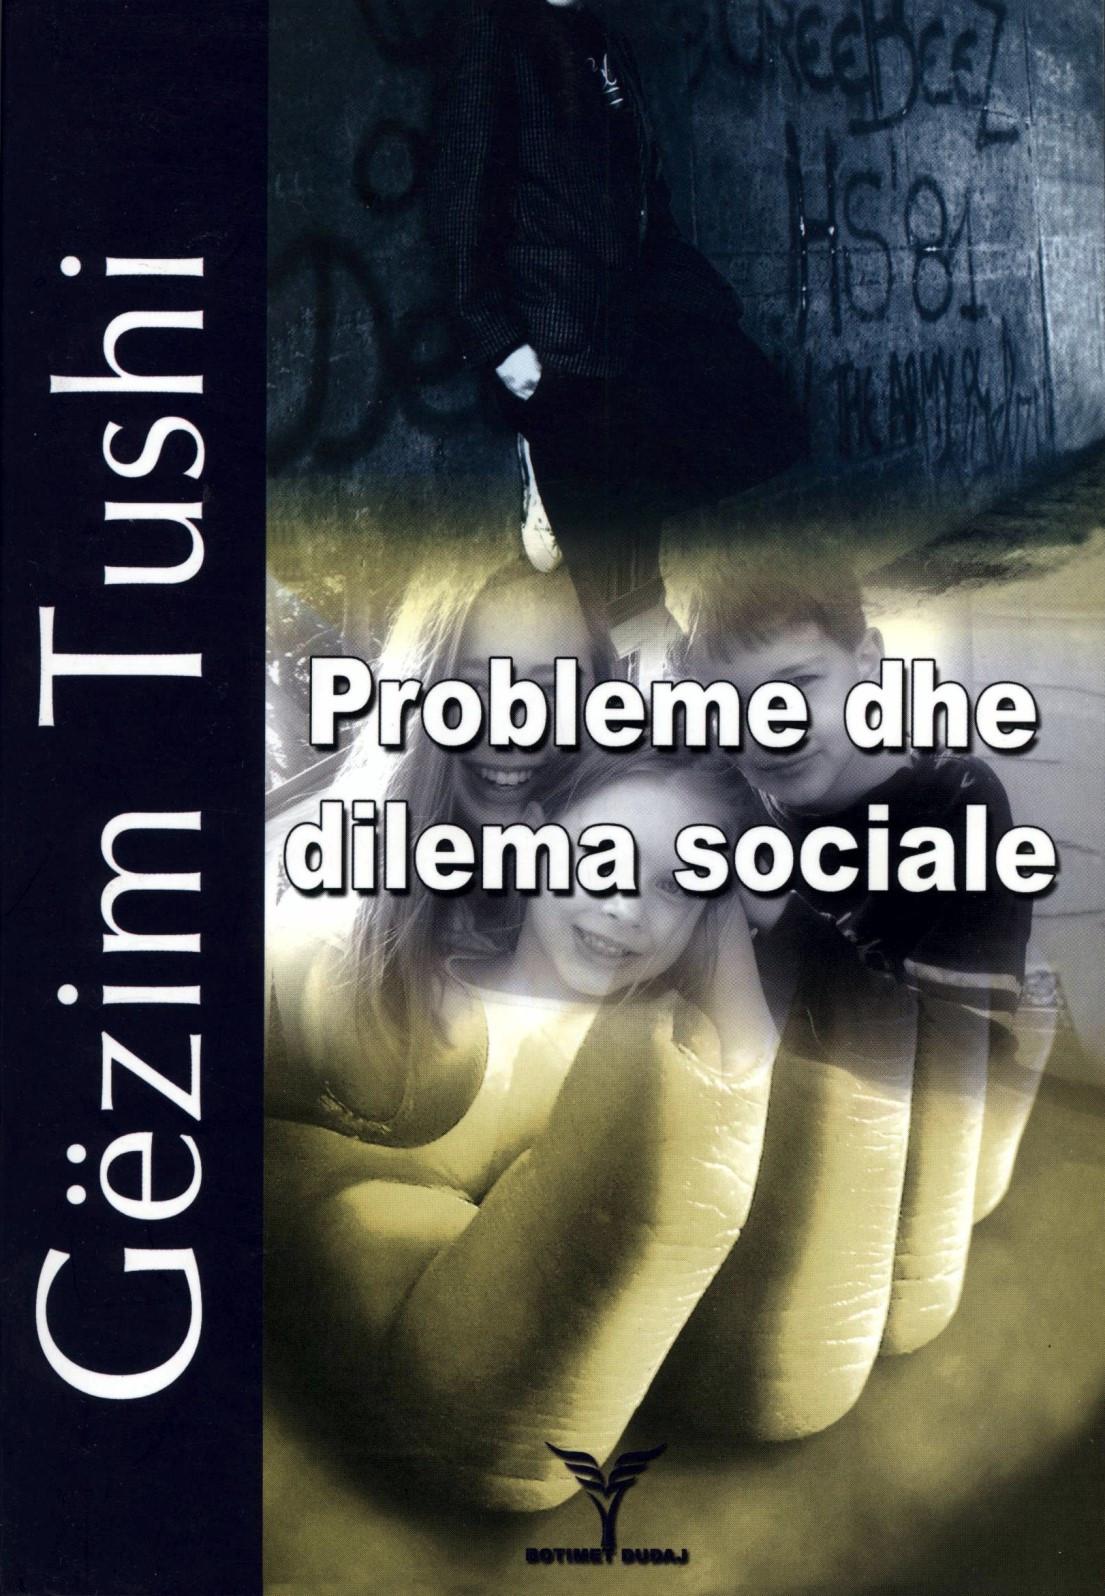 Probleme dhe dilema sociale